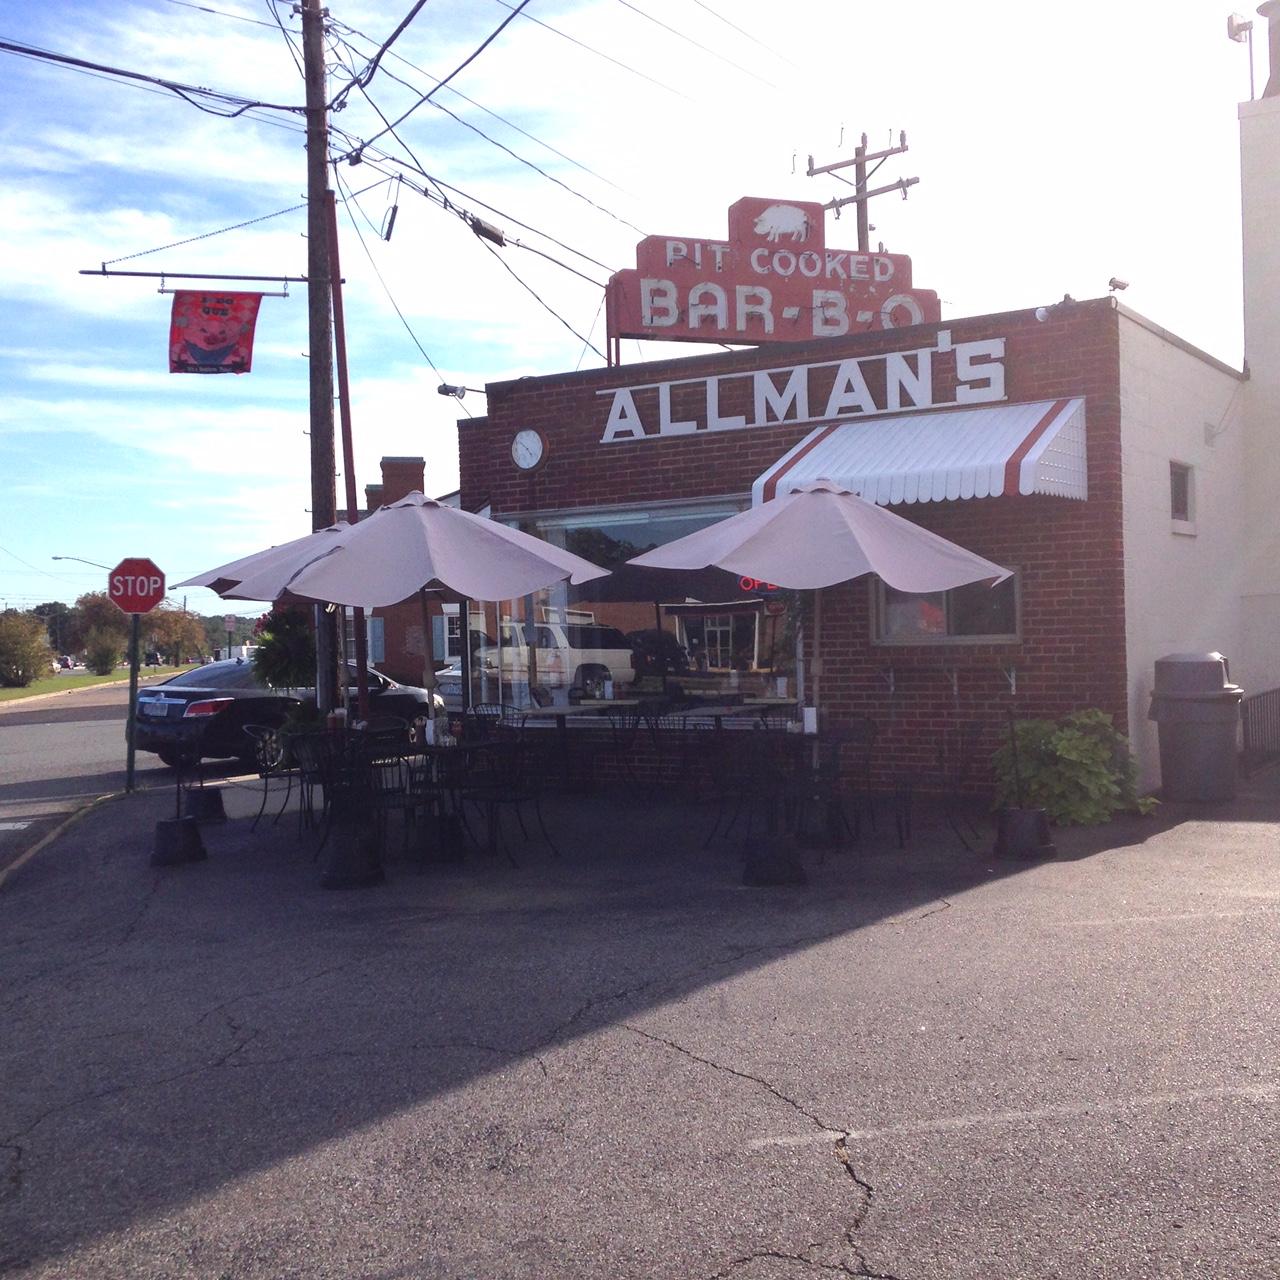 Allmans BBQ